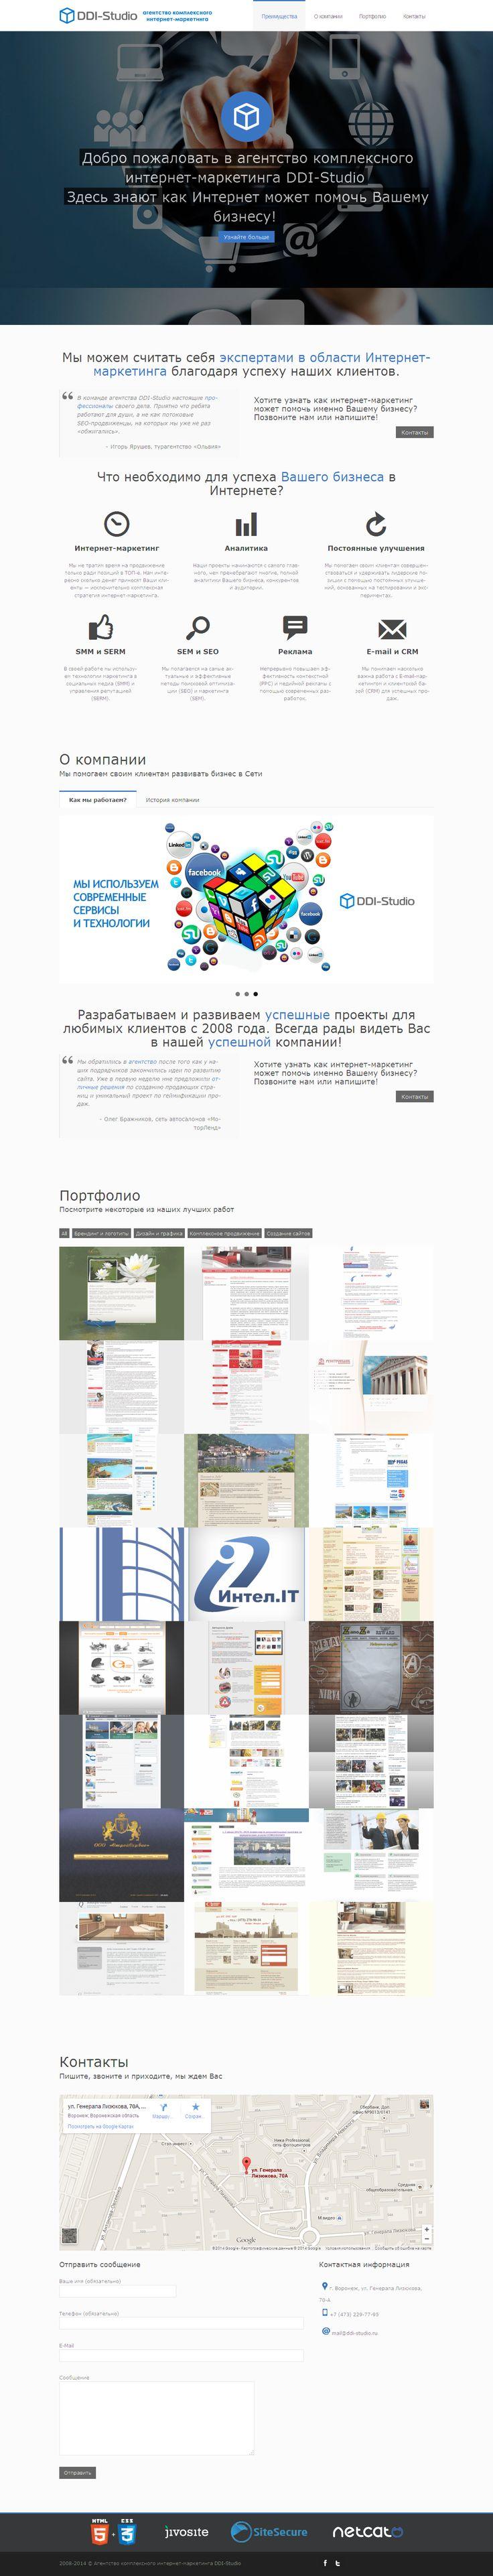 DDI-Stusio - агентство комплексного интернет-маркетинга  в Воронеже